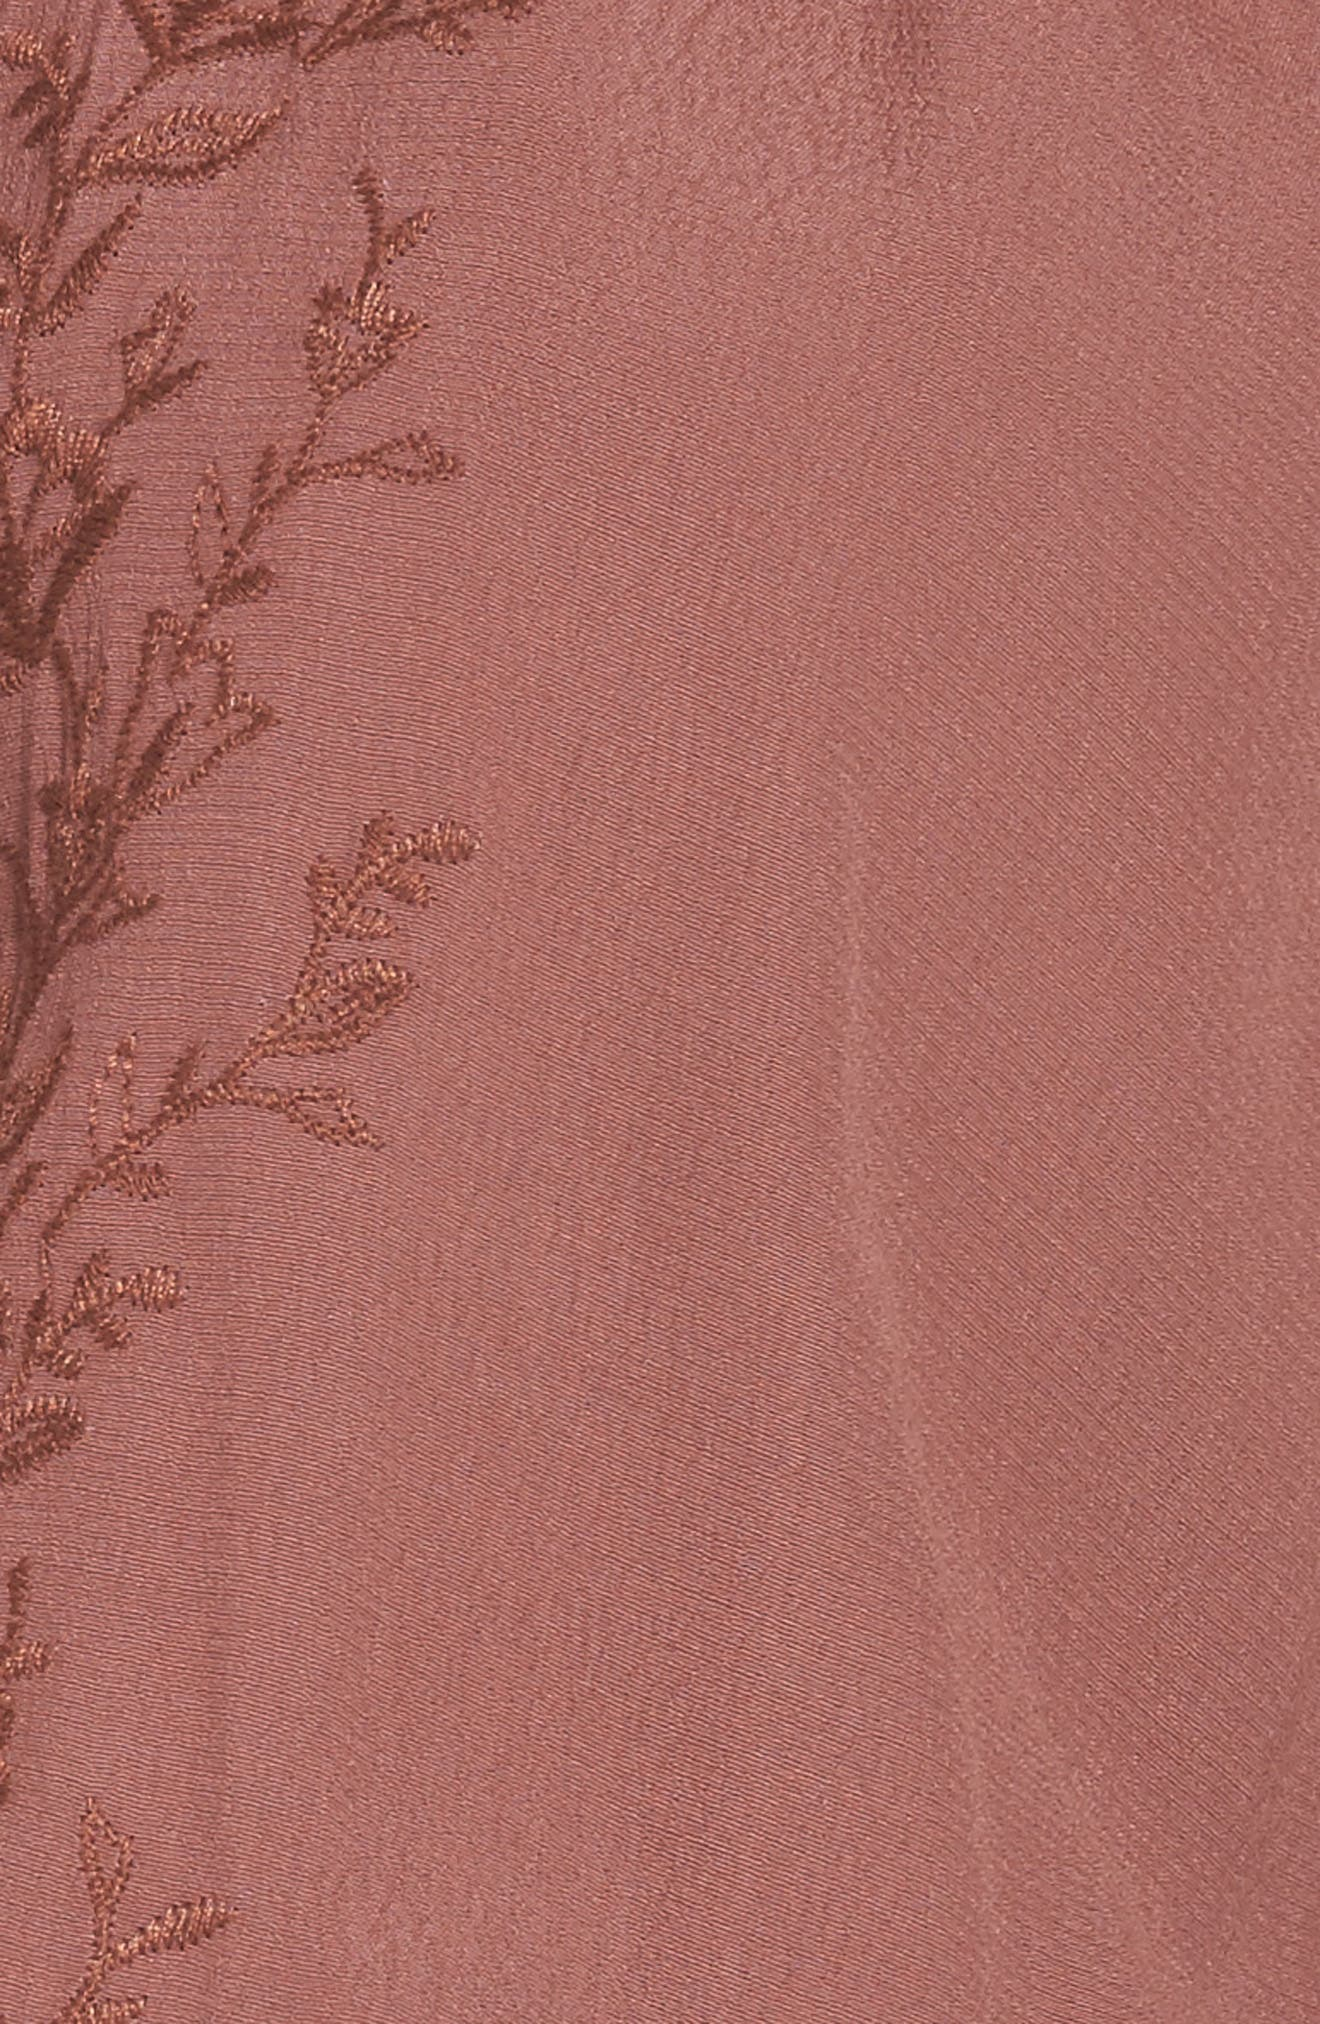 Melinda Blouson Dress,                             Alternate thumbnail 10, color,